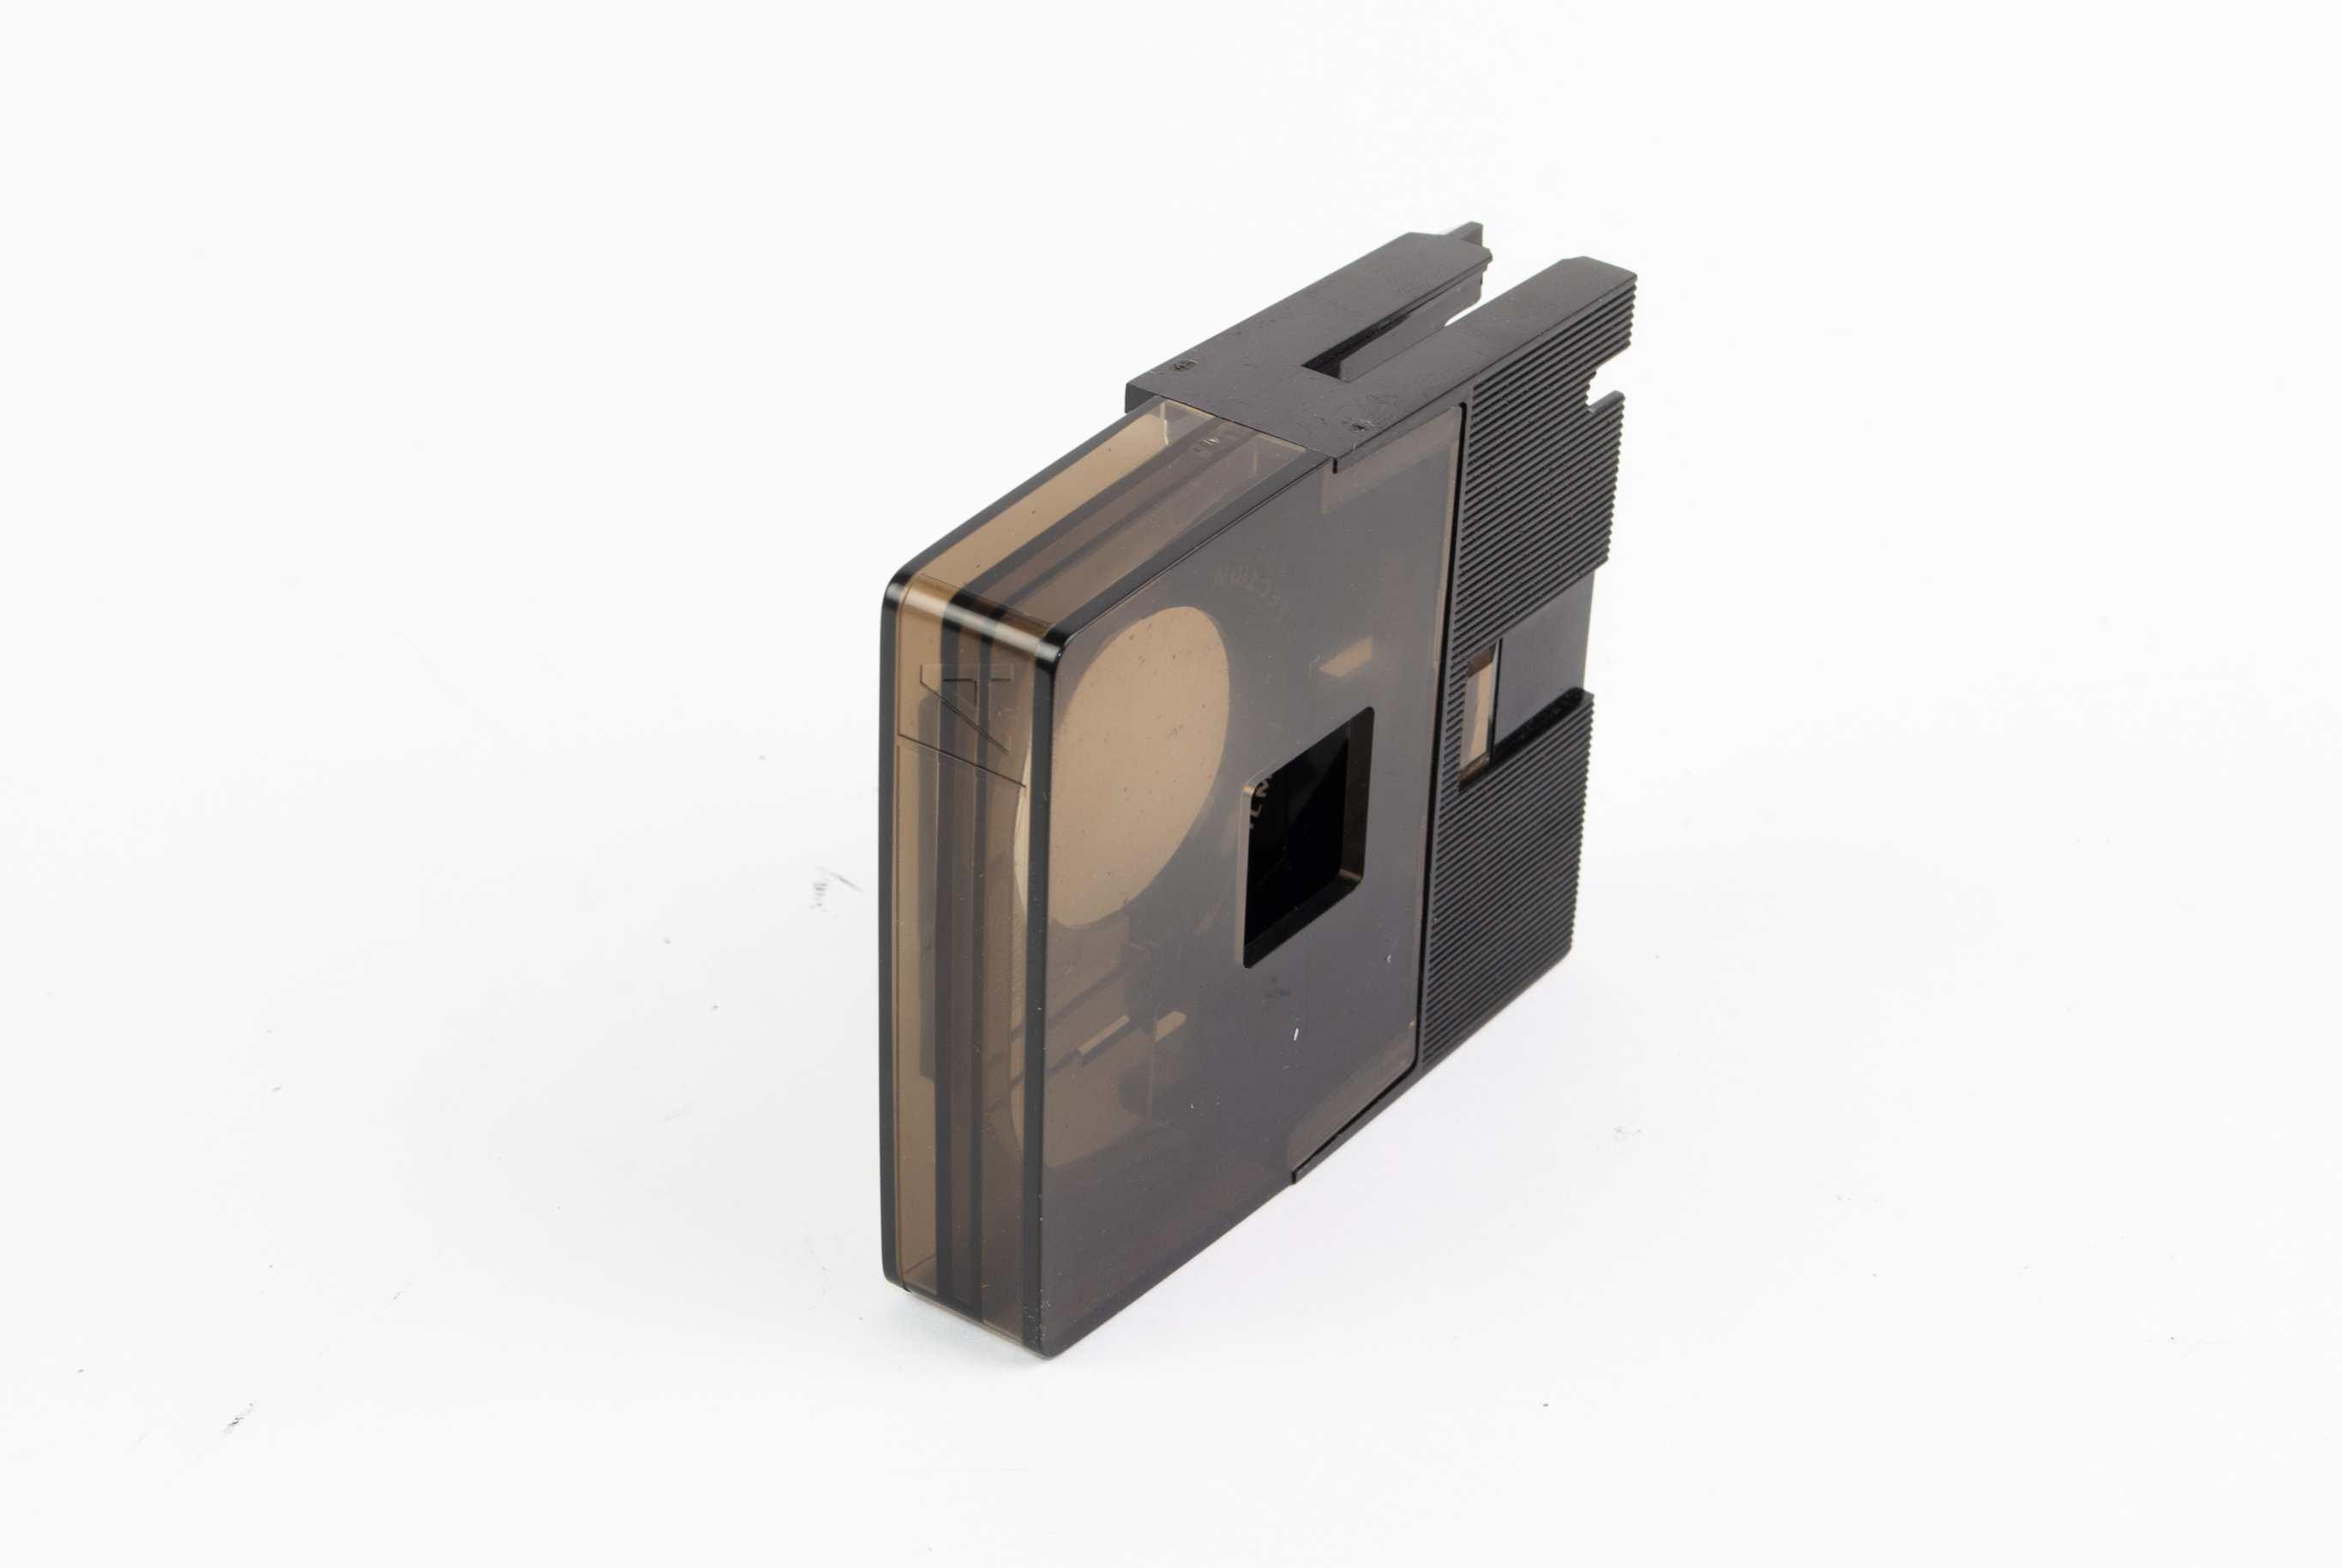 Projection cartridge A - No D521